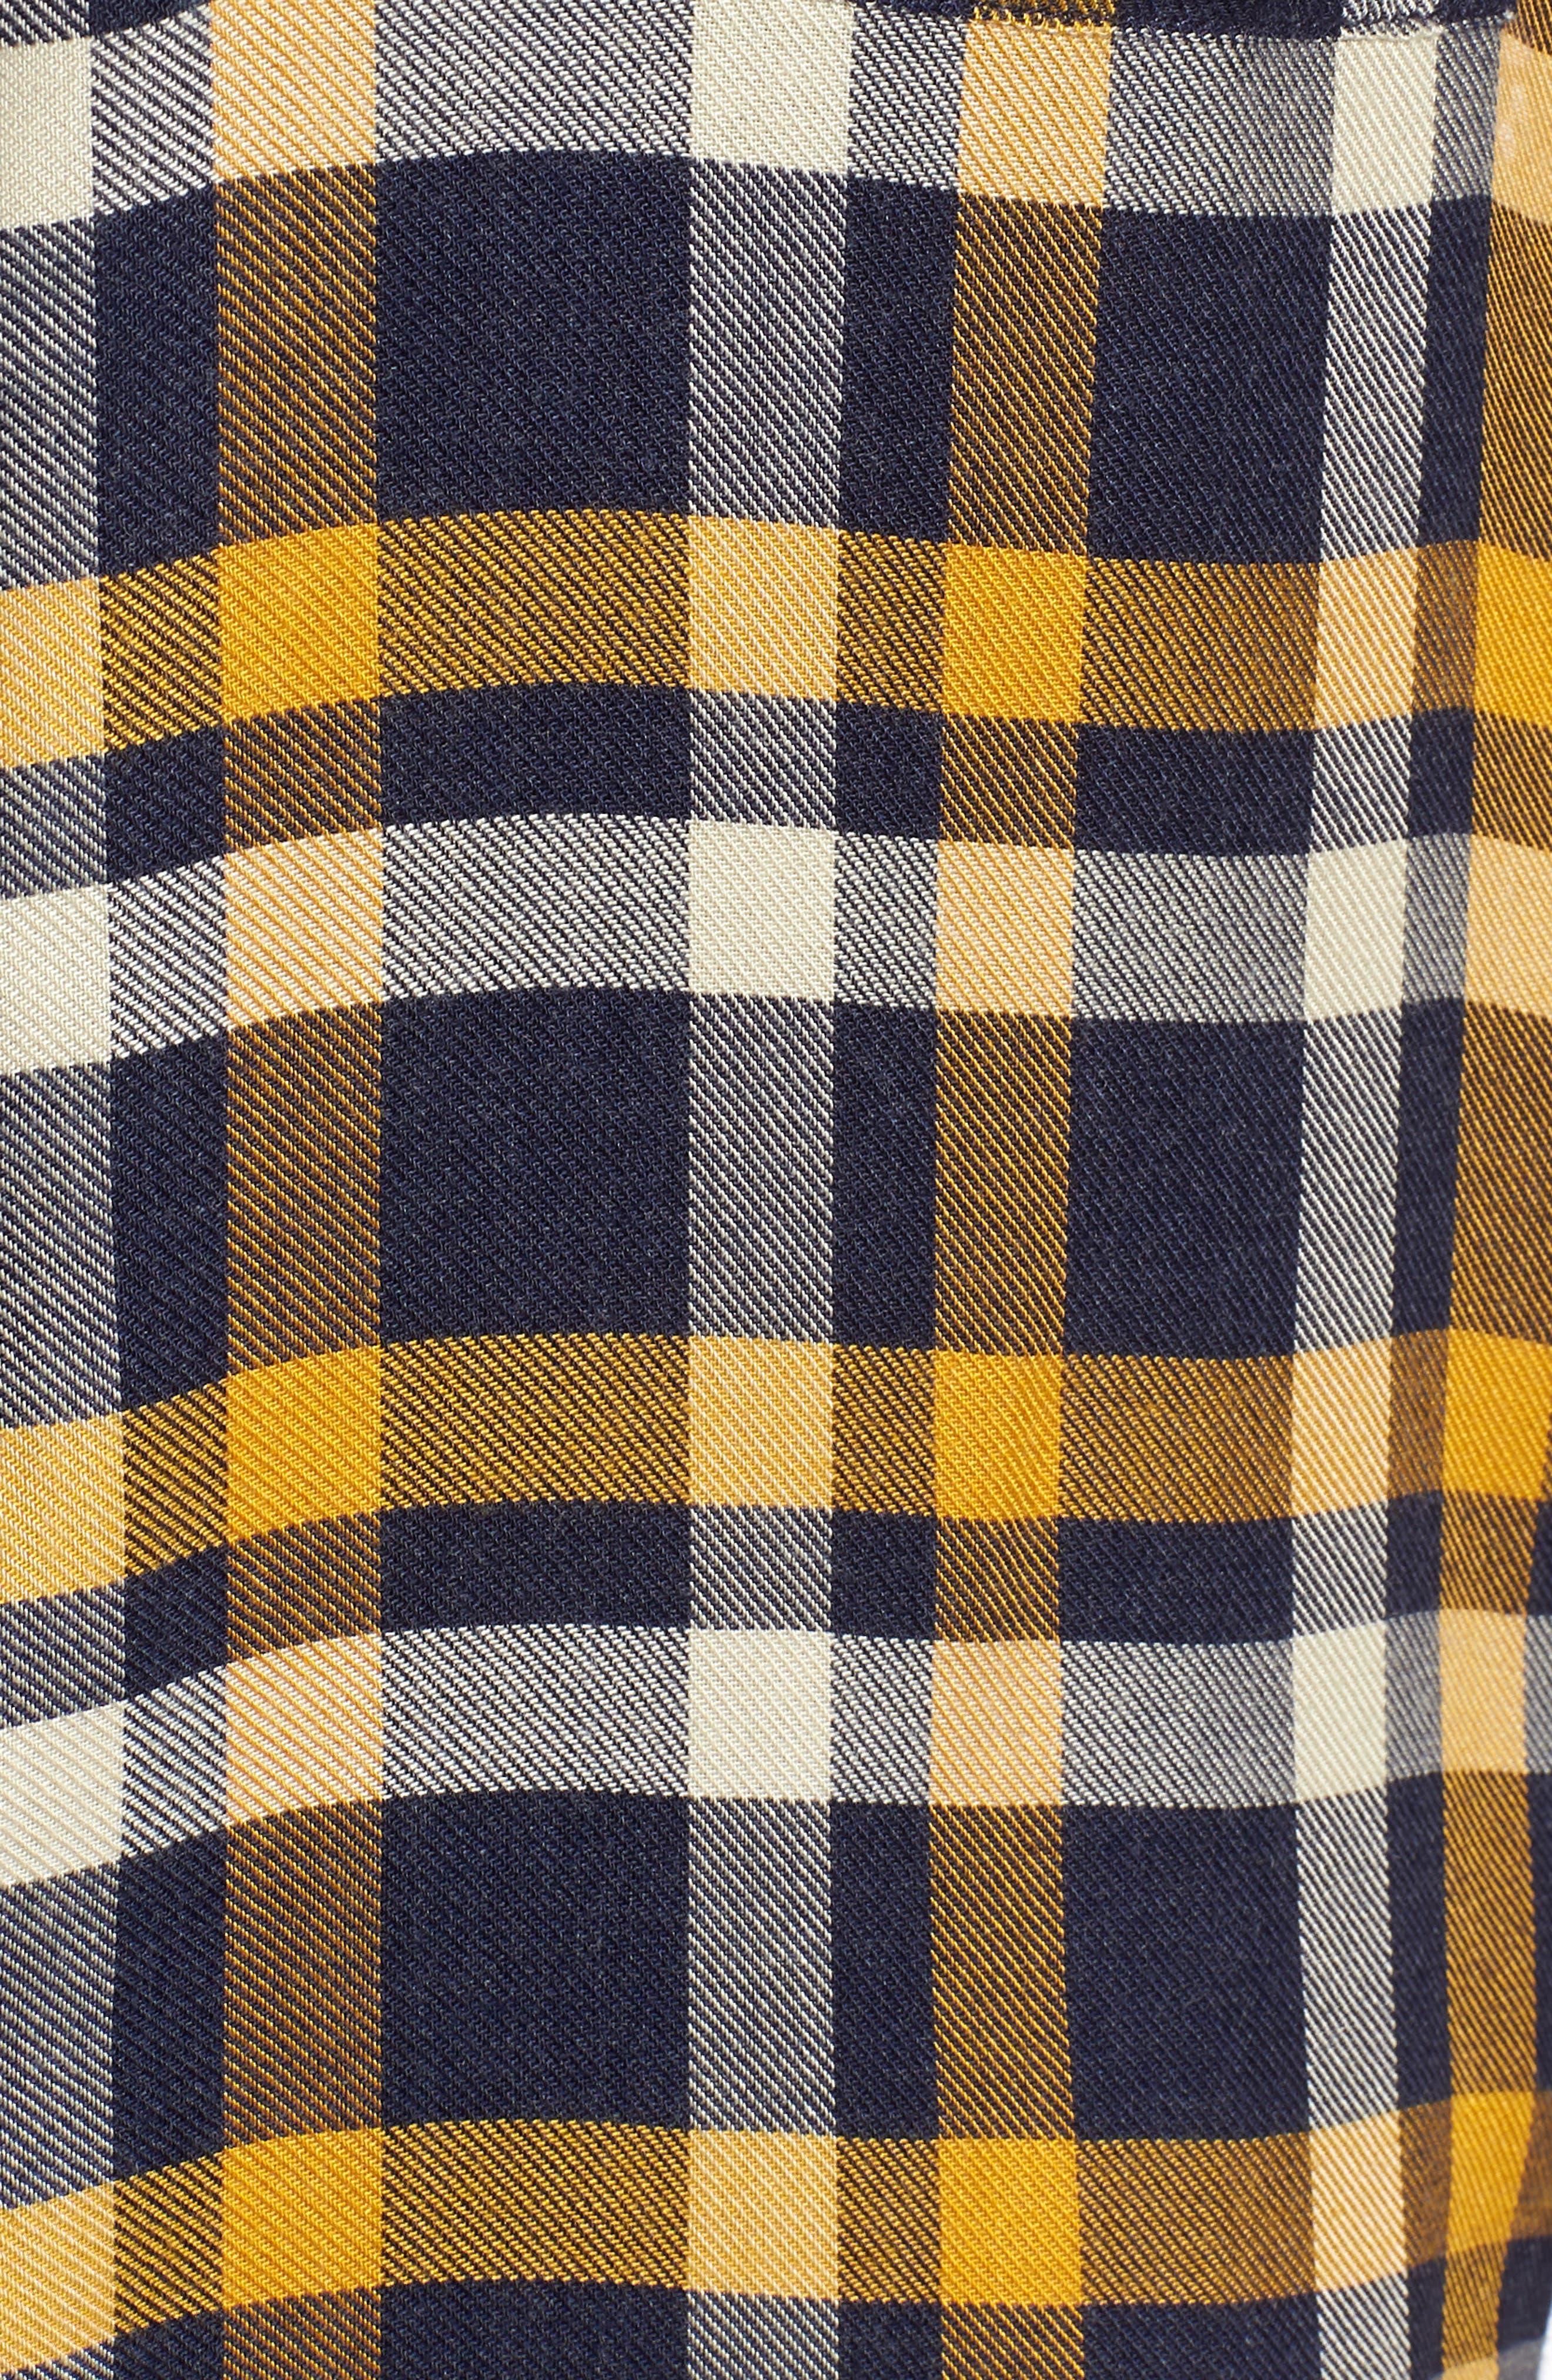 Plaid Boyfriend Shirt,                             Alternate thumbnail 5, color,                             Navy Maritime Offset Wndw Pane